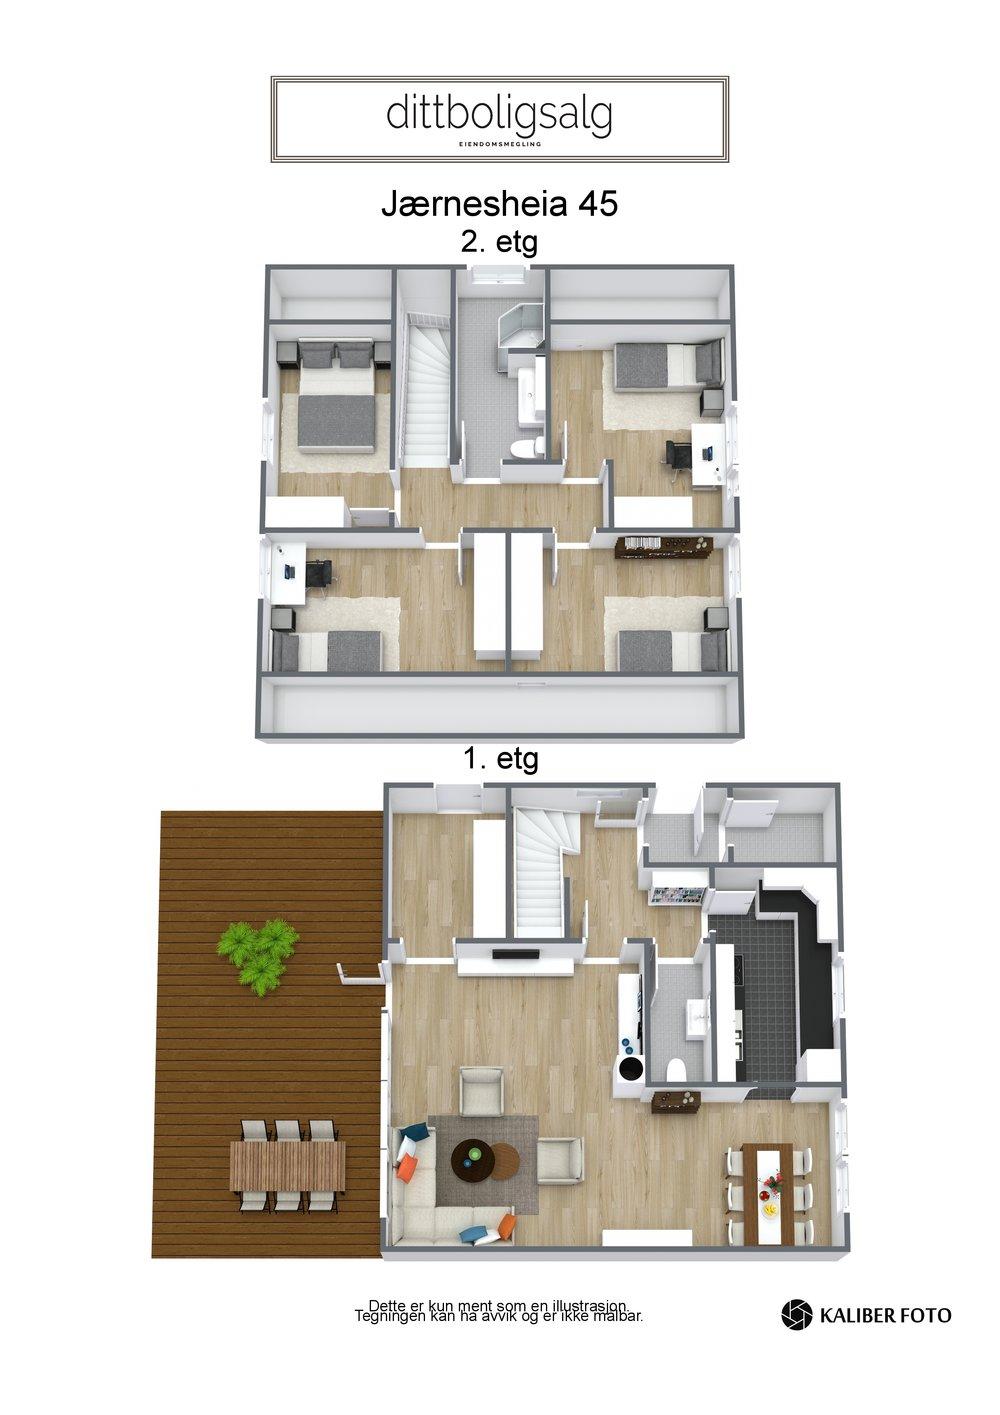 Project letterhead - Jærnesheia 45 - 3D Floor Plan.jpg